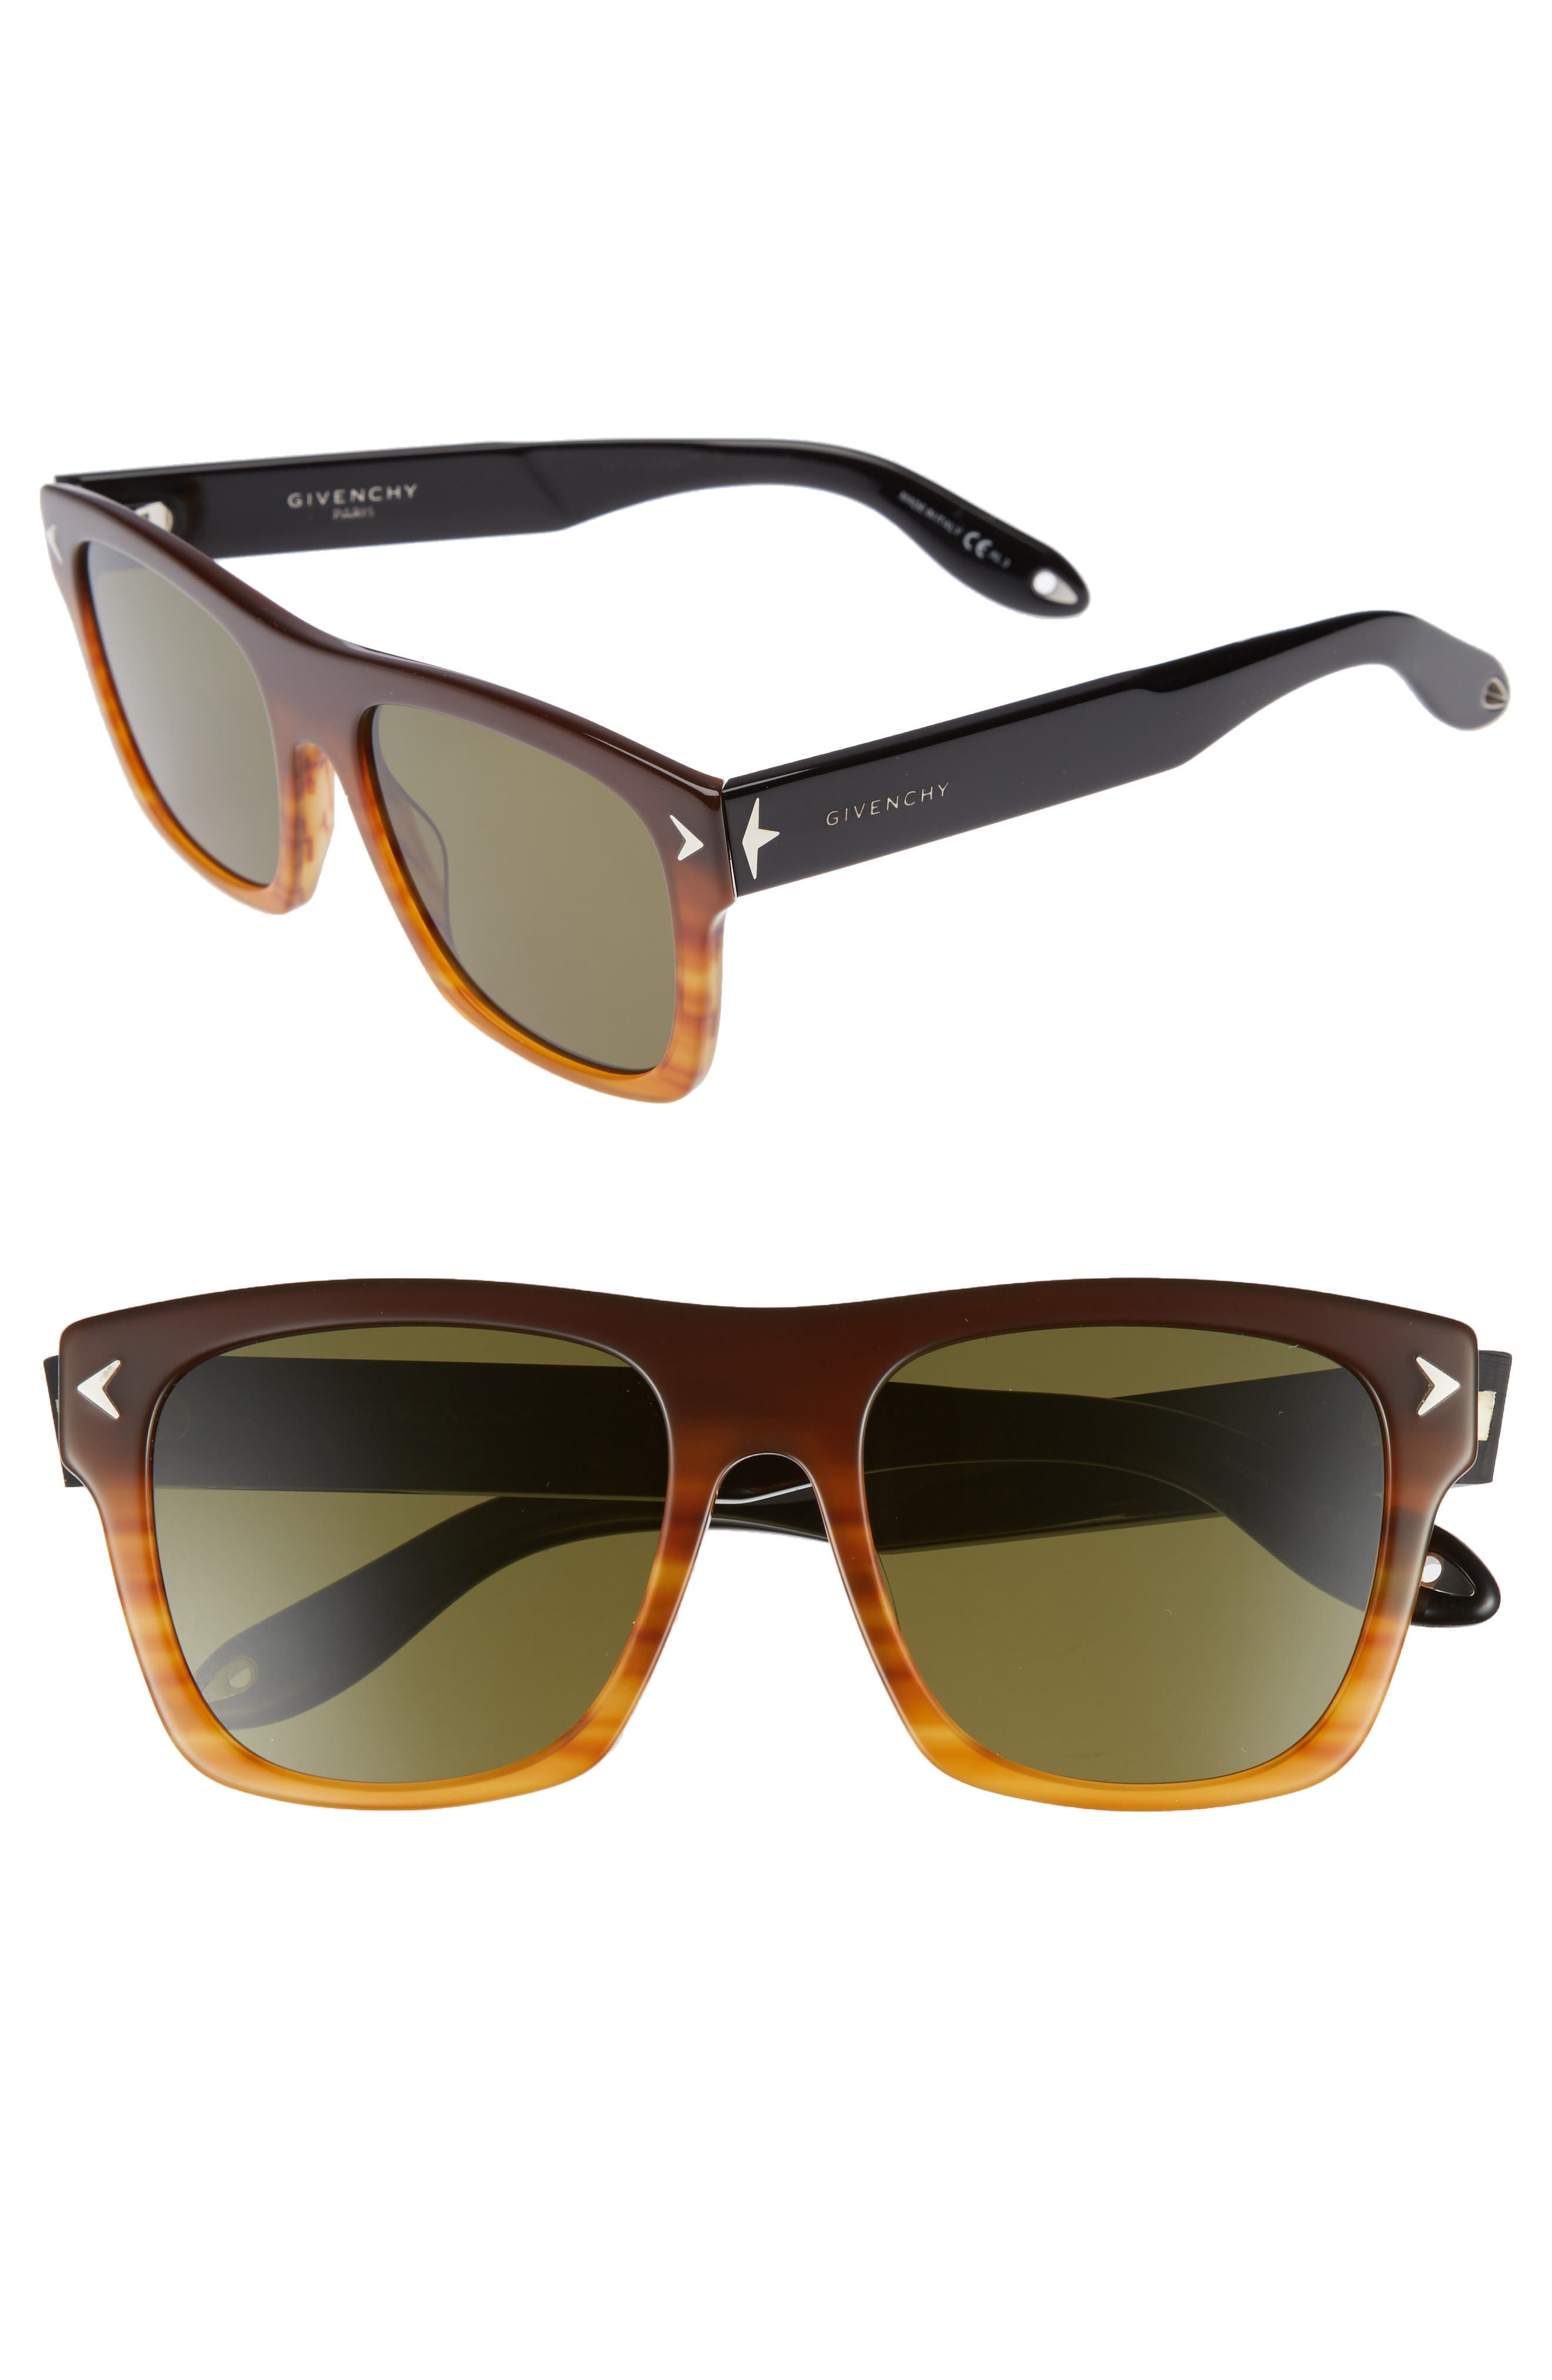 Main Image - Givenchy 55mm Square Sunglasses